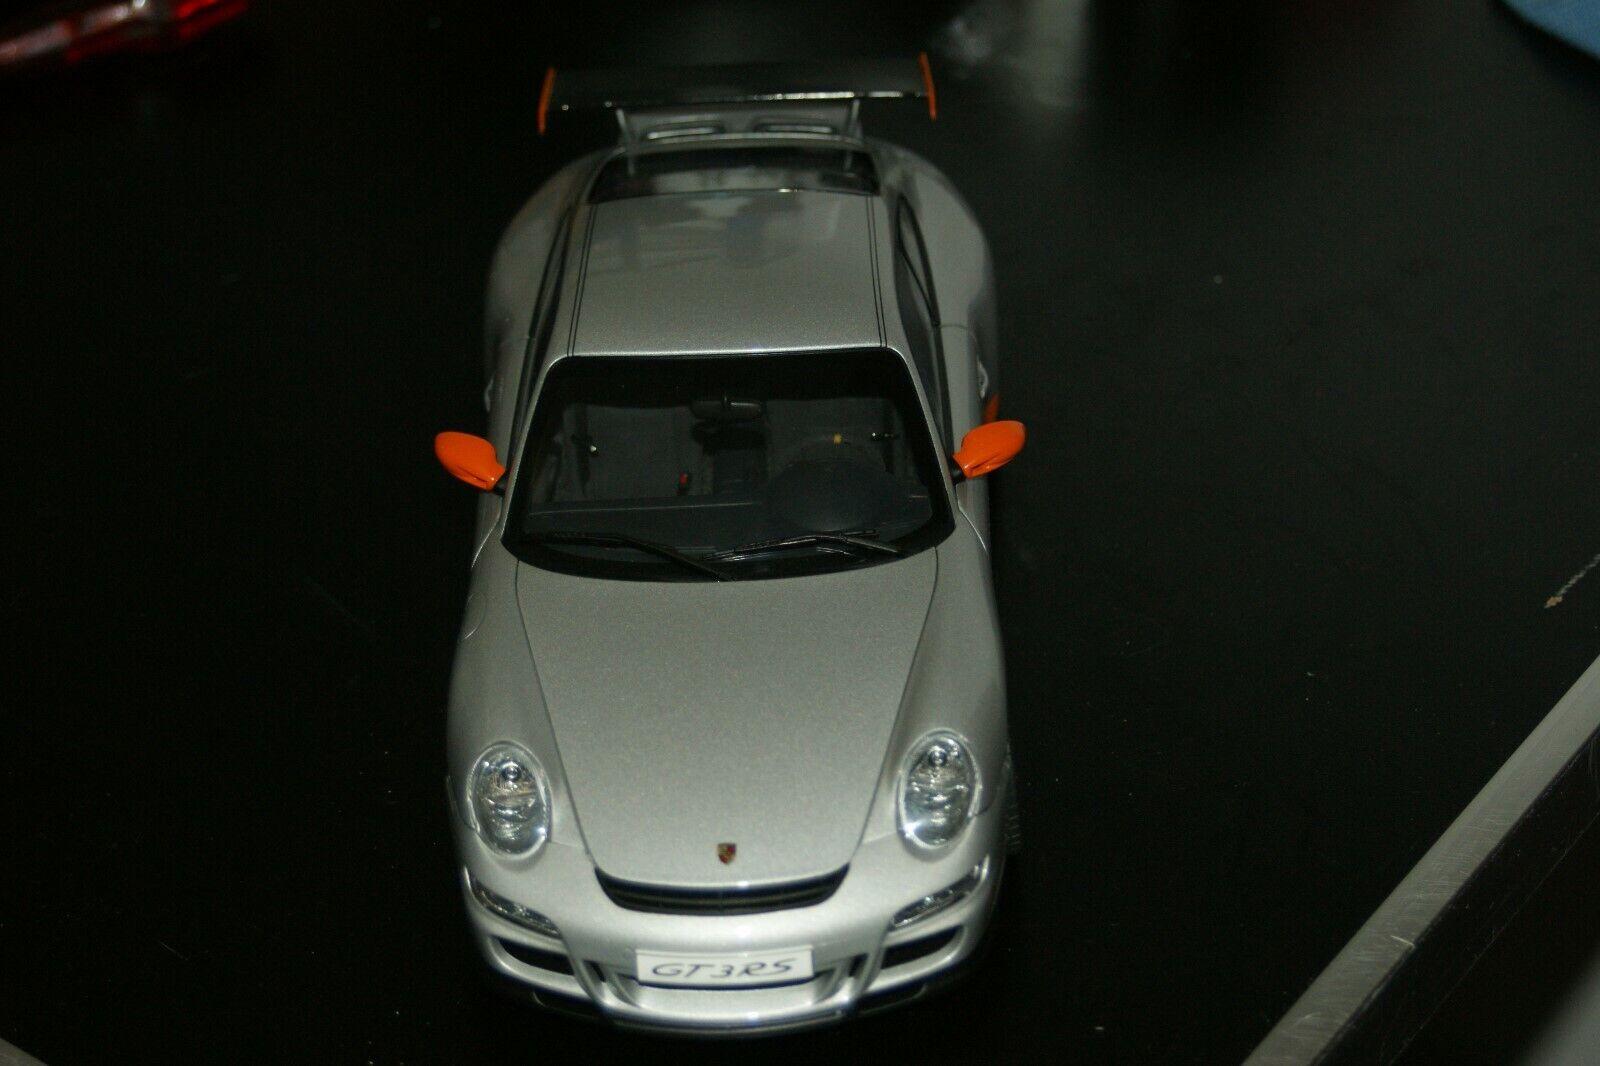 1 18 Carart Porsche 911 997 GT3 RS grau   Orange stripes